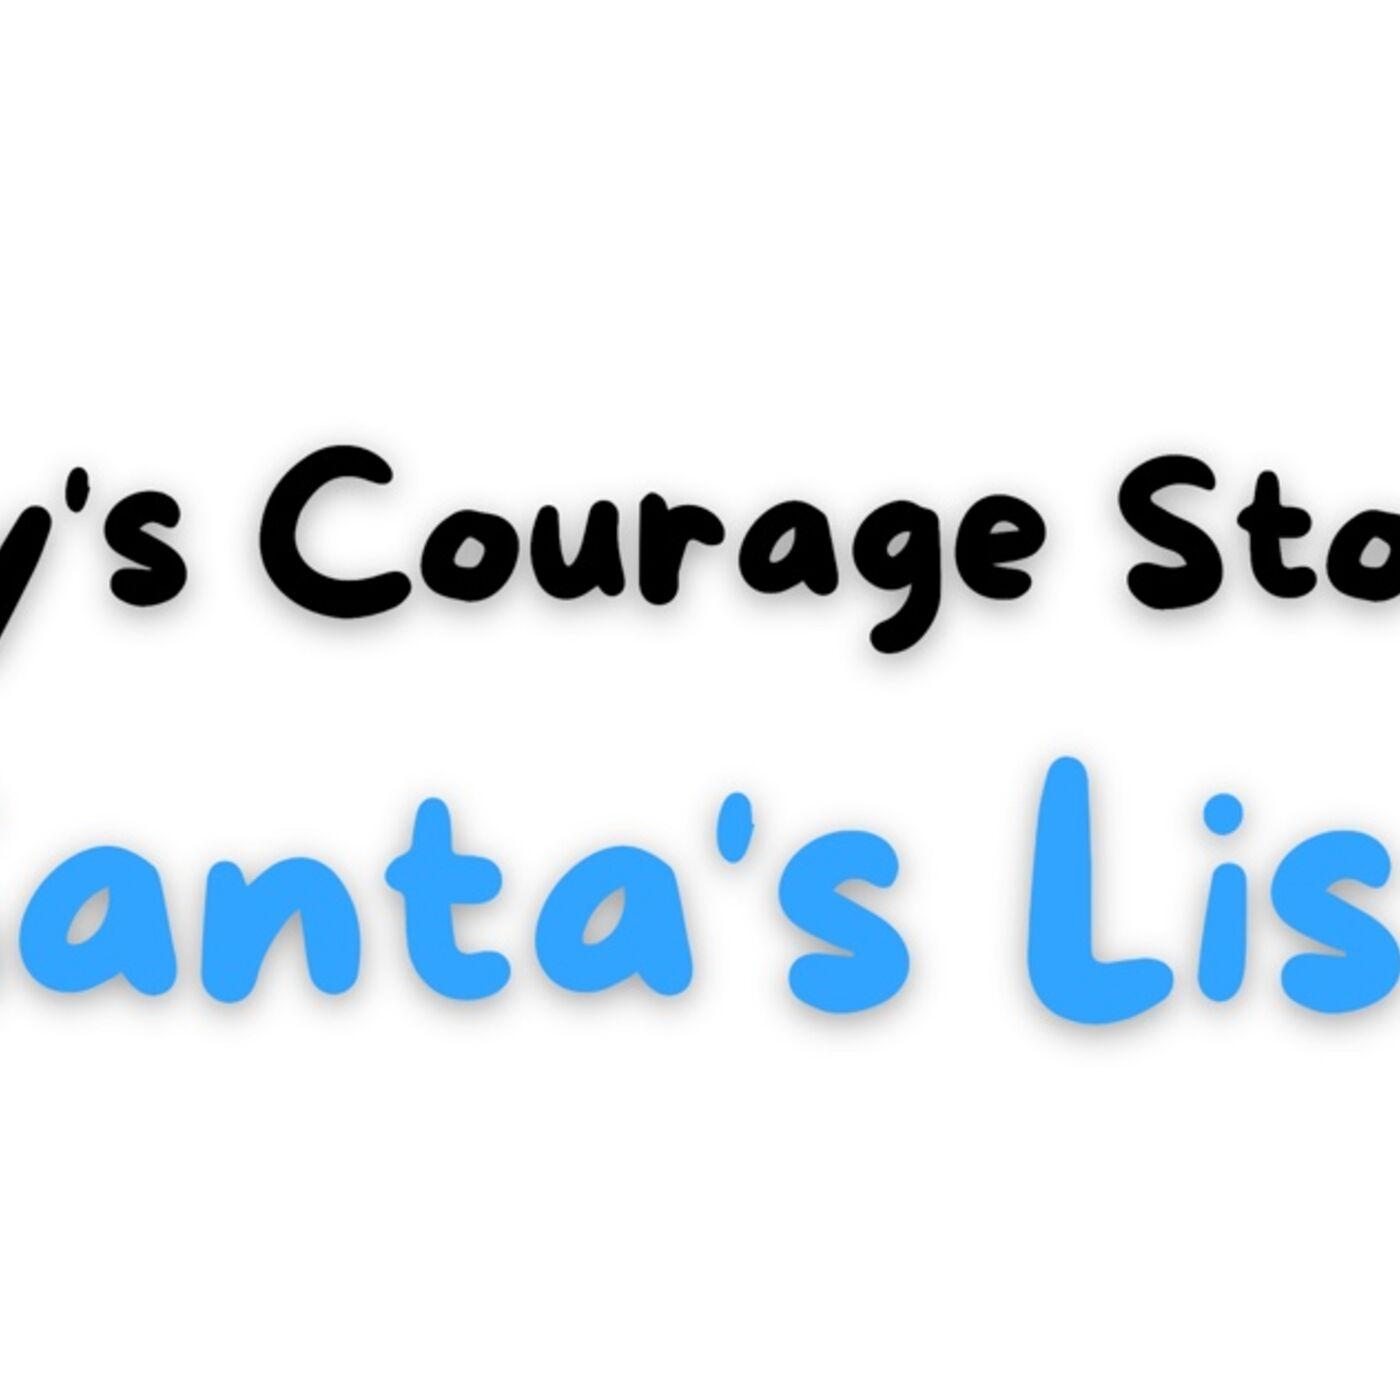 Courage Story 1: Santa's List